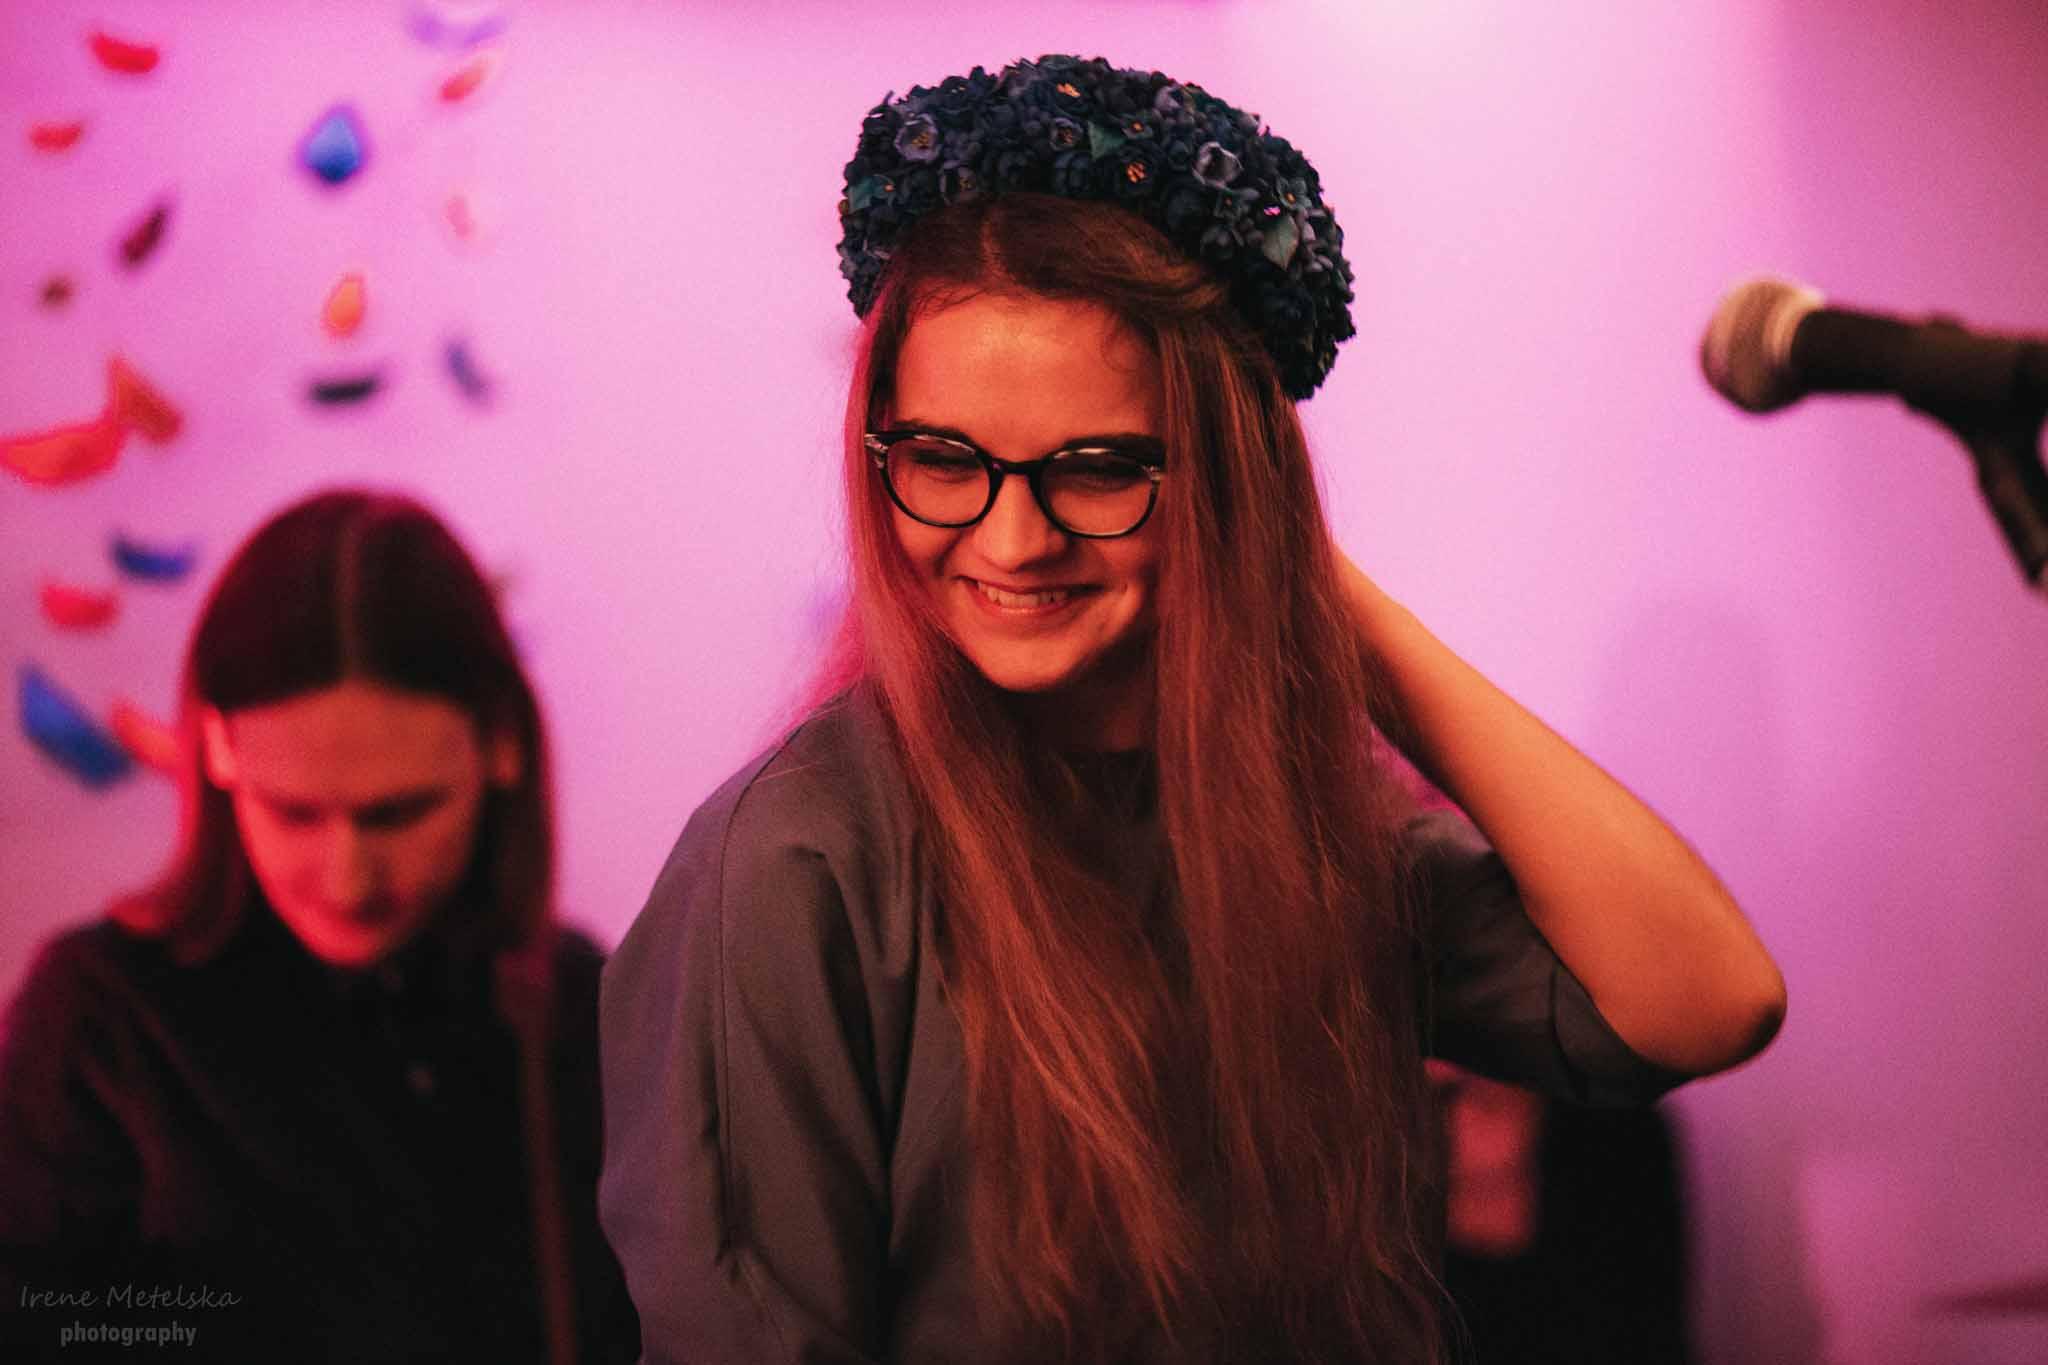 nastiaznykaje ФОТОГАЛЕРЕЯ — UA MUSIC | Енциклопедія української музики